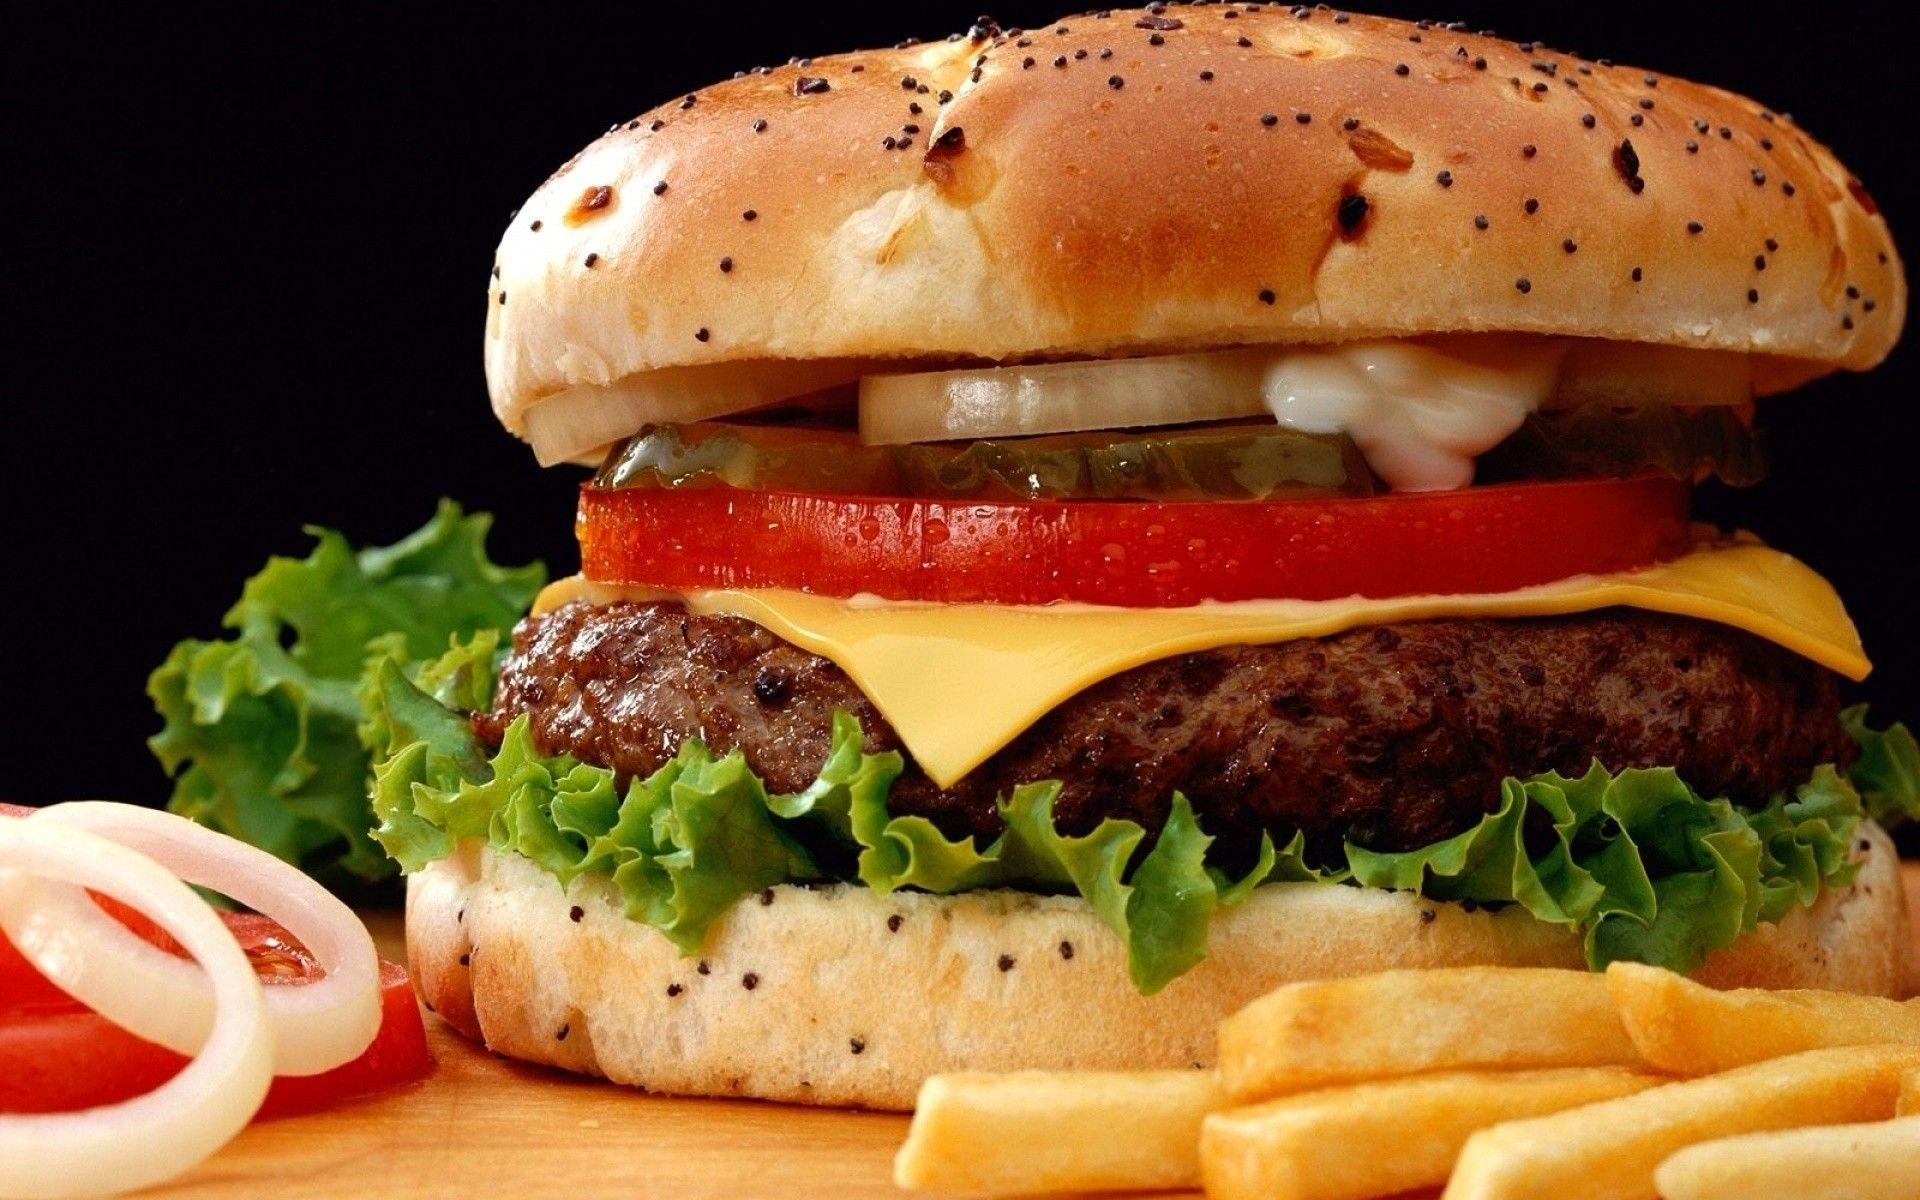 004 Food French Fries Onions Fast Hamburgers Essay Stunning Topics Argumentative Introduction Titles Full